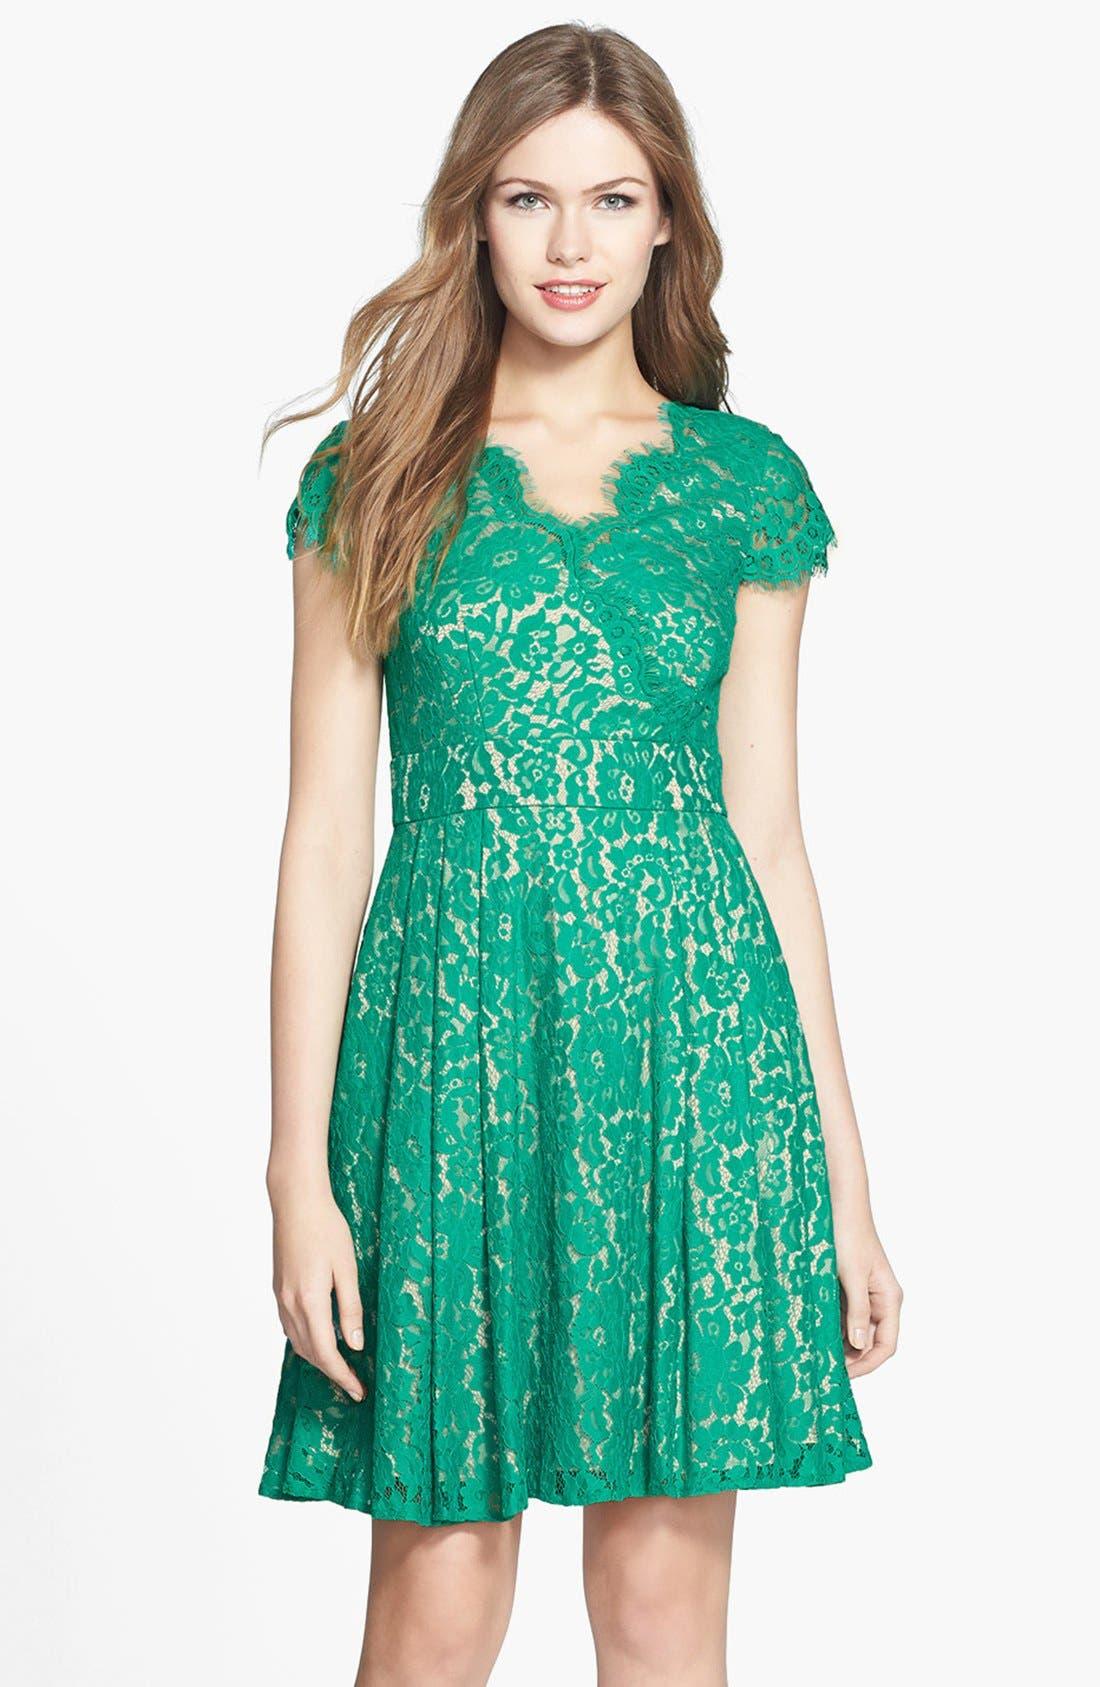 Alternate Image 1 Selected - Eliza J Short Sleeve Lace Fit & Flare Dress